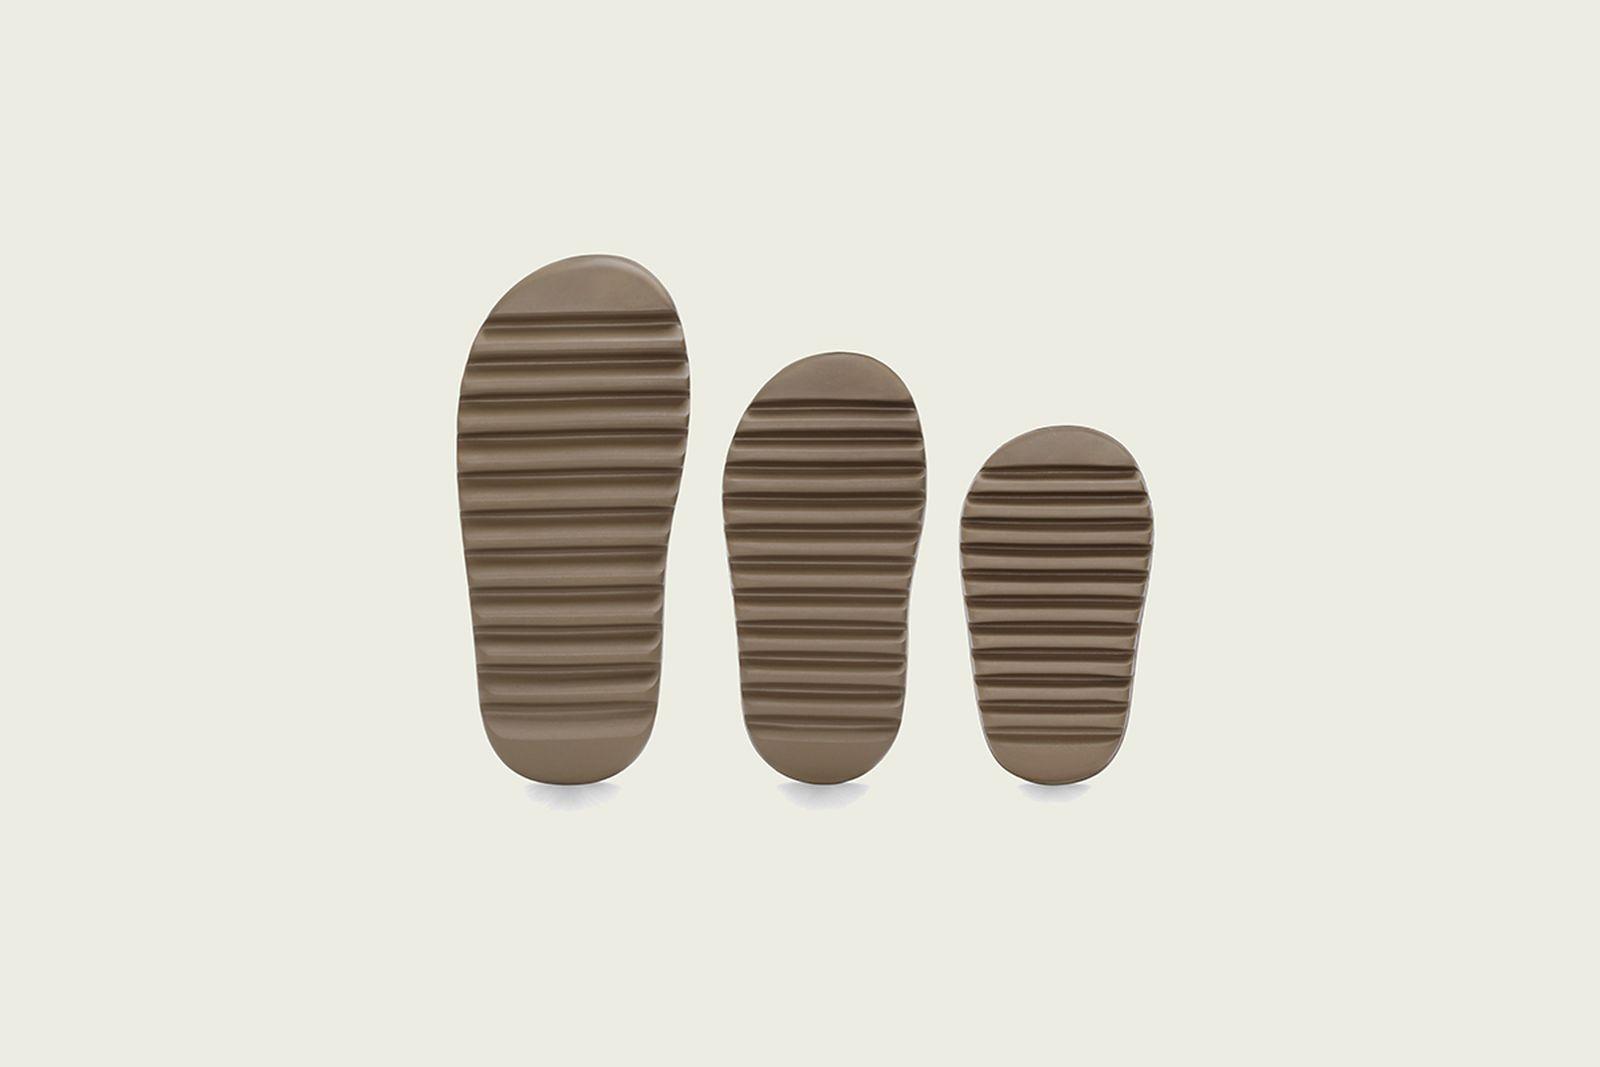 adidas-yeezy-slide-release-date-price-07